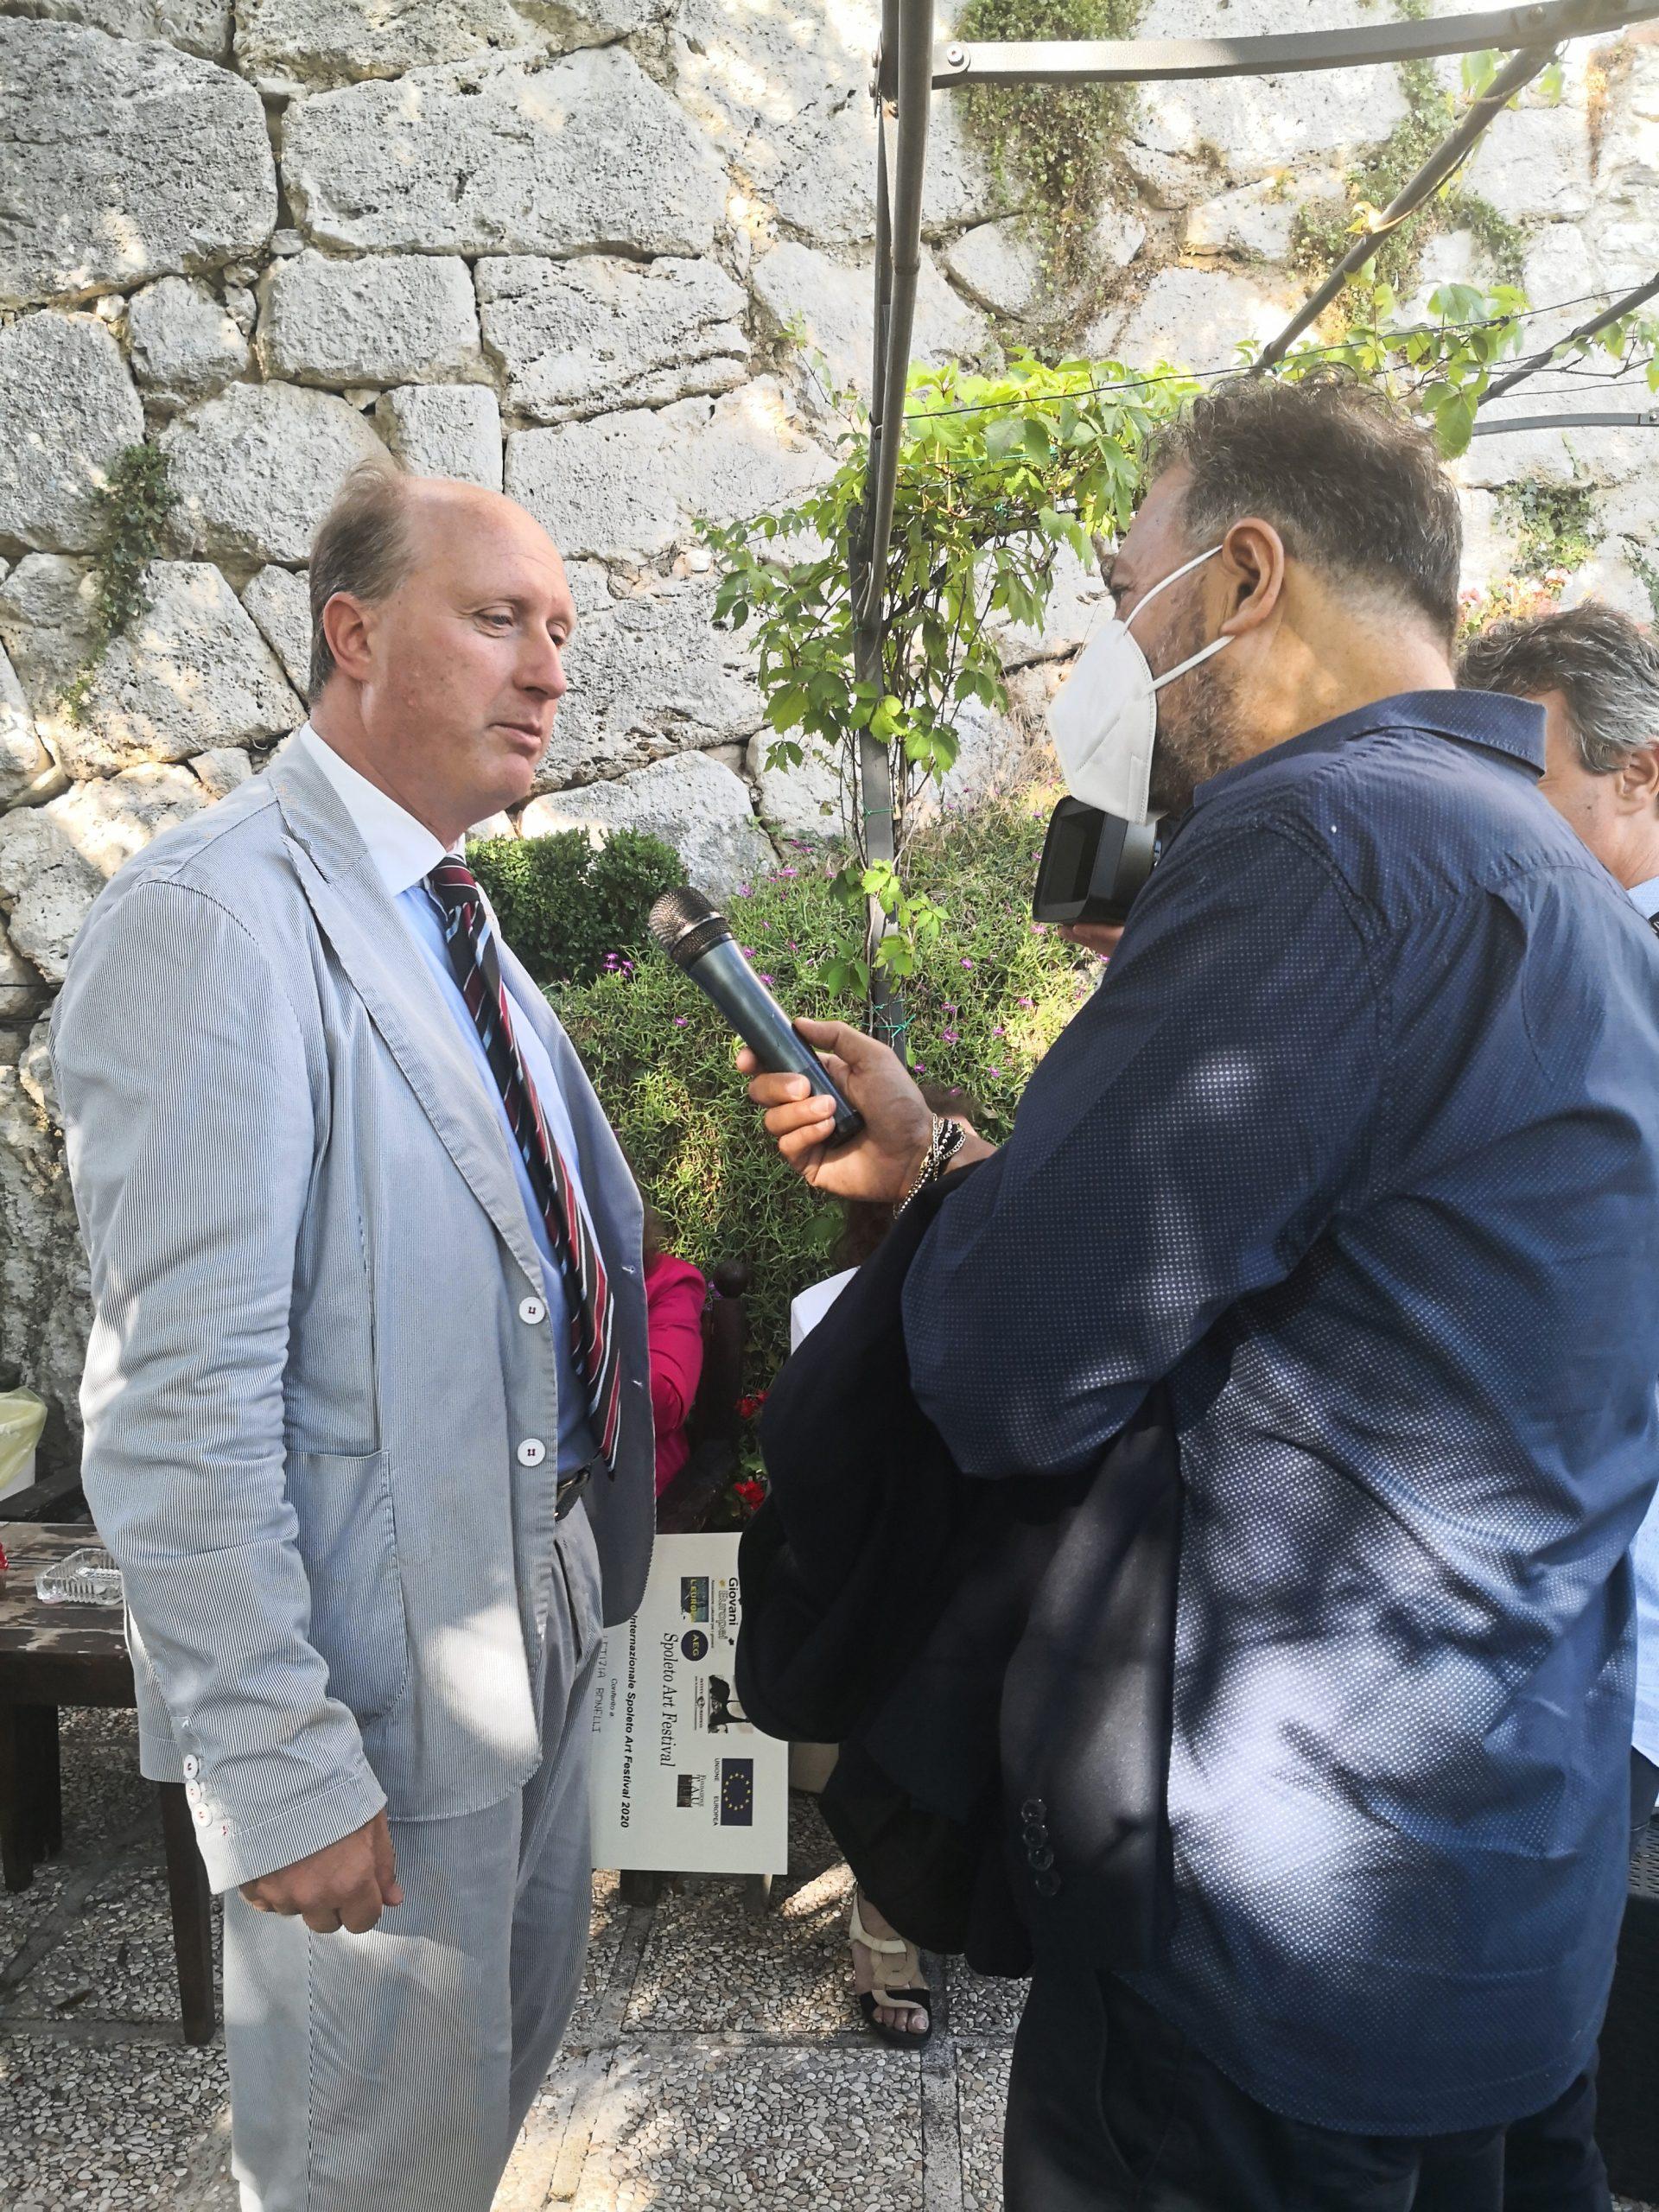 Spoleto Art festival 2021 - intervista